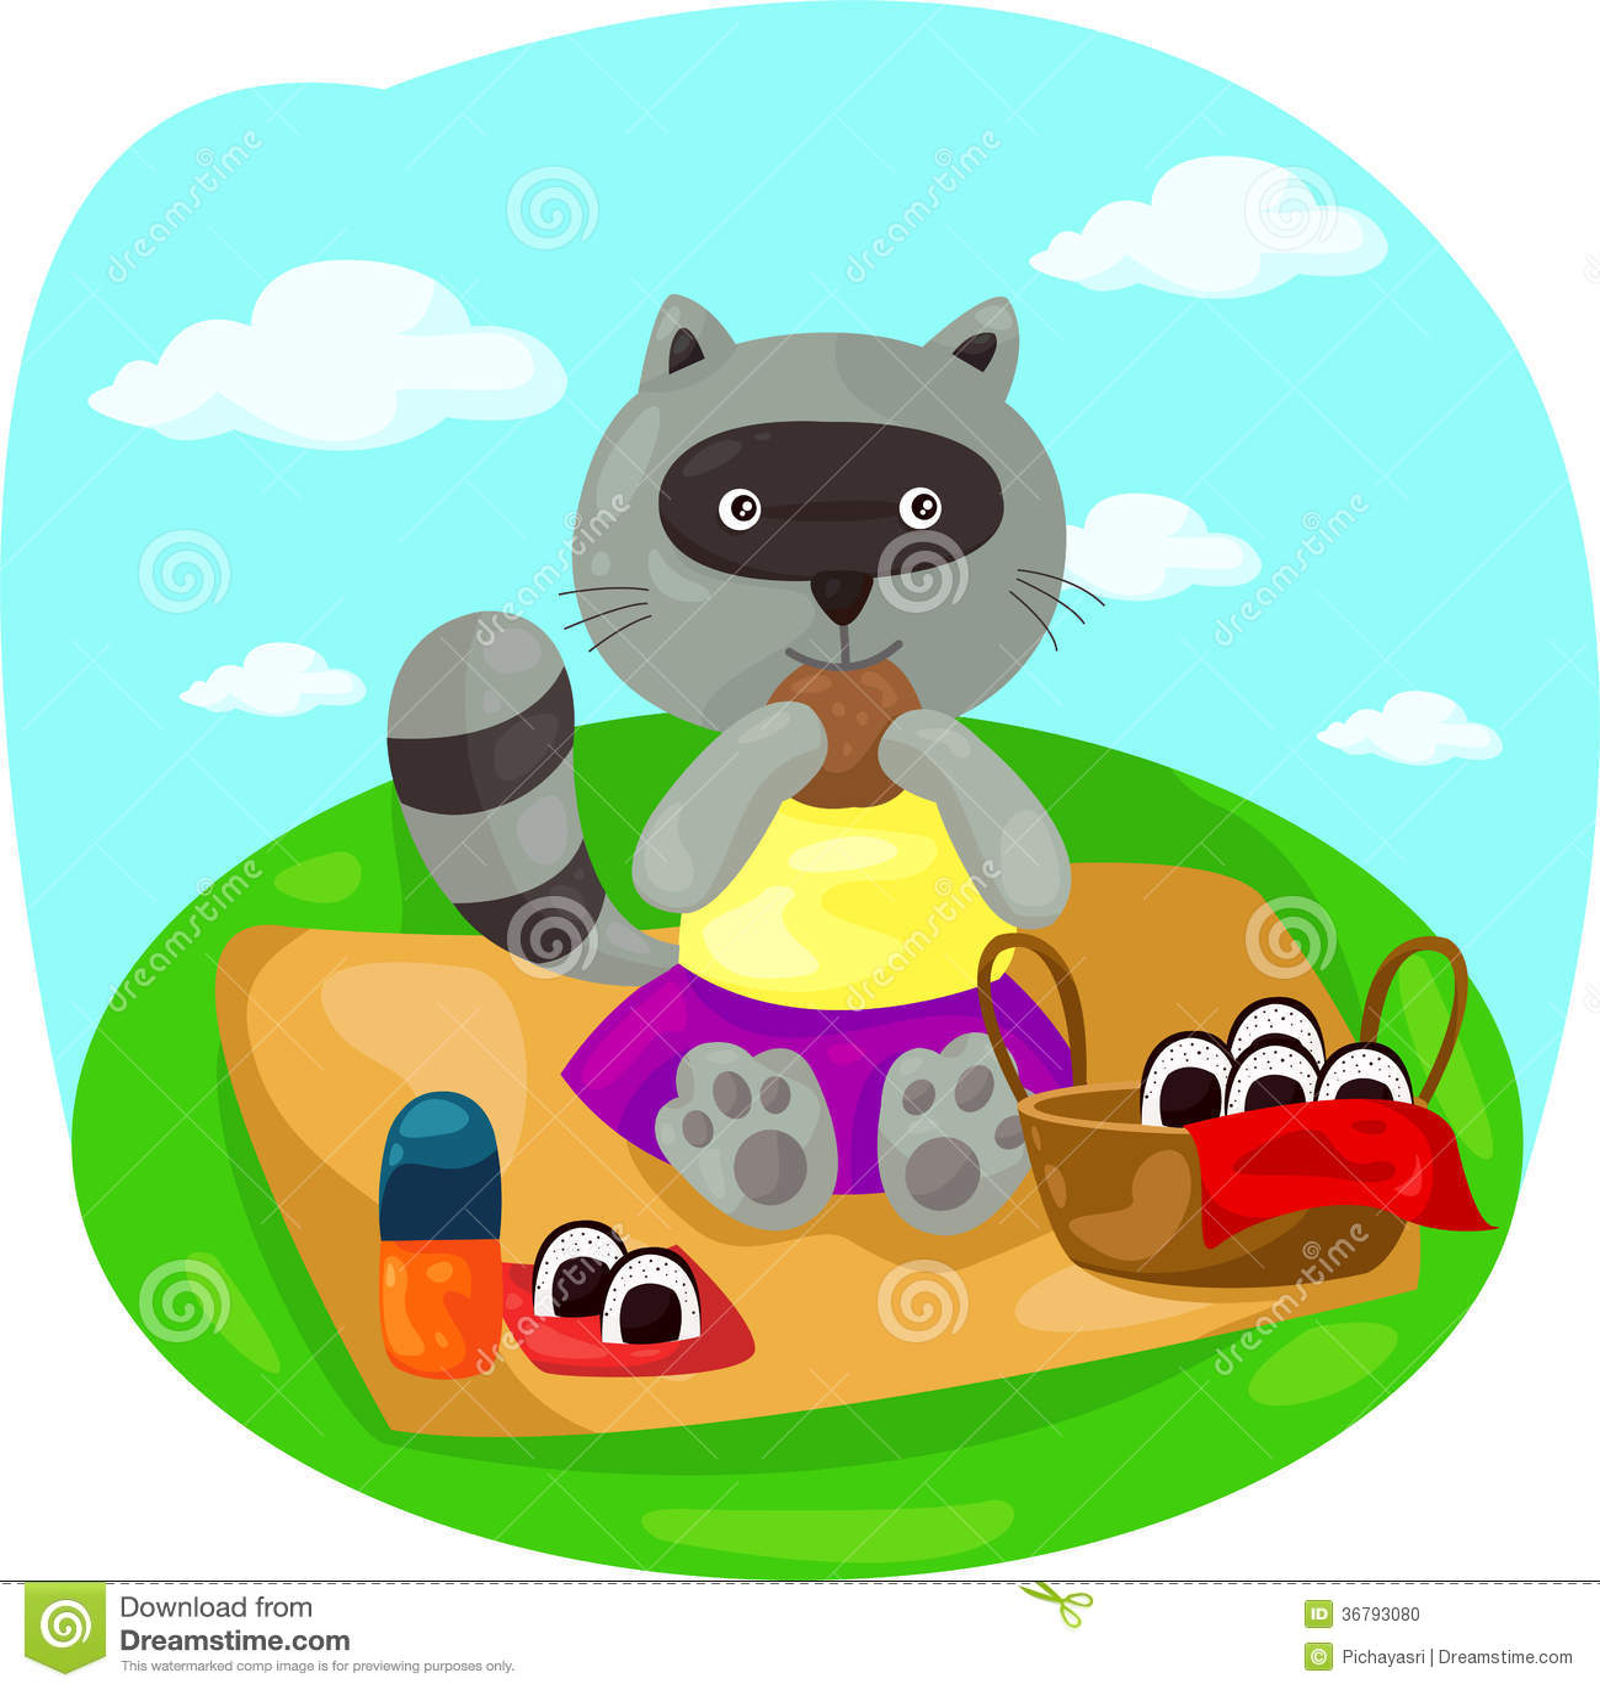 Cartoon Raccoon Picnic Stock Photo - Image: 36793080